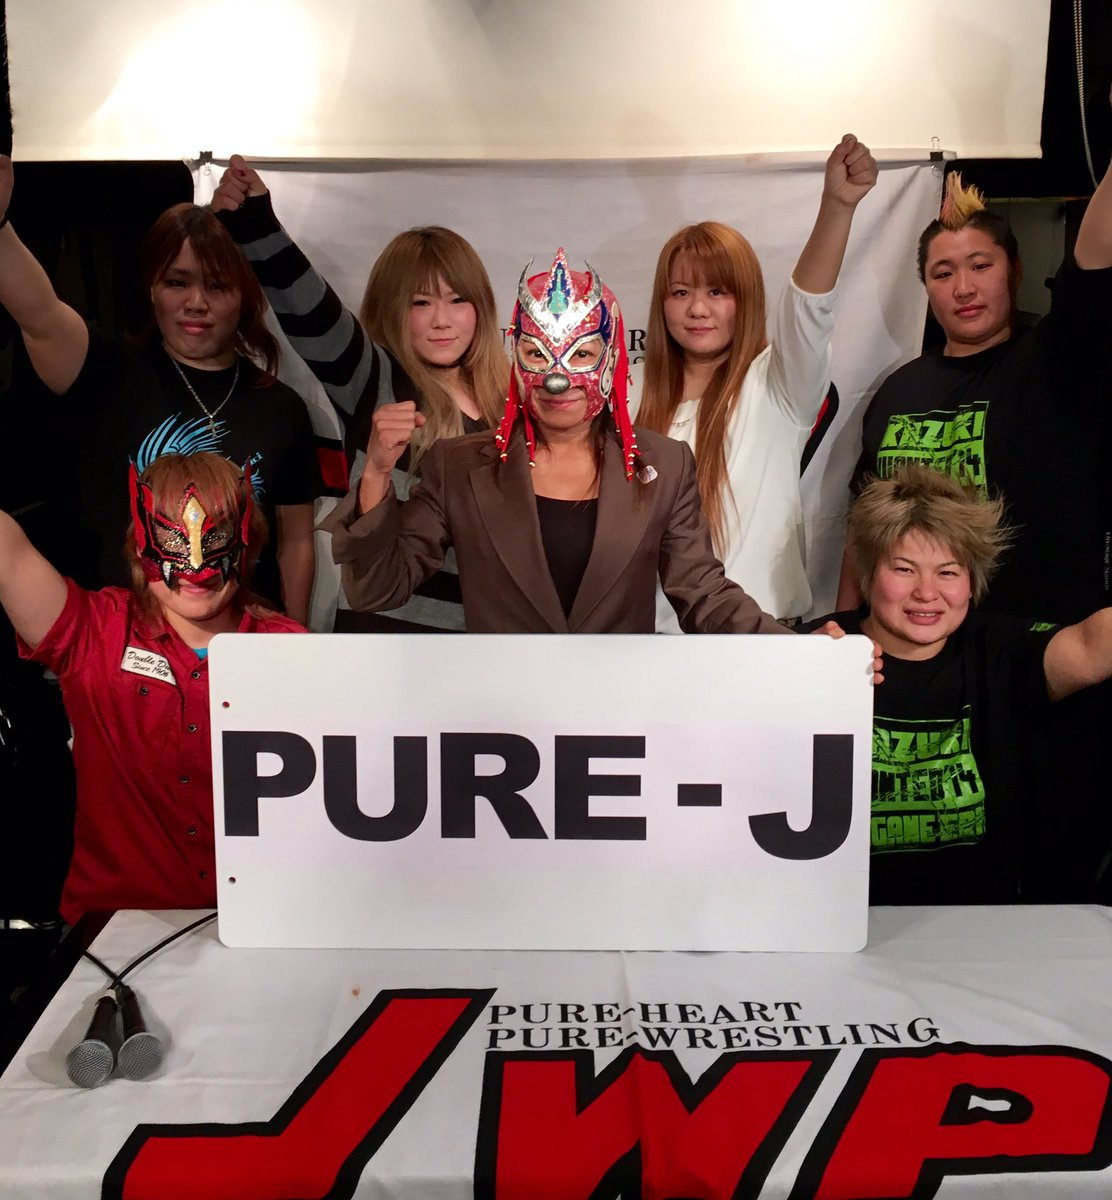 【JWP女子プロレス】≪新団体名決定!≫ 8月11日旗揚げする新団体の名称が『PURE-J』(ピュアジェイ)  に決定致しました。